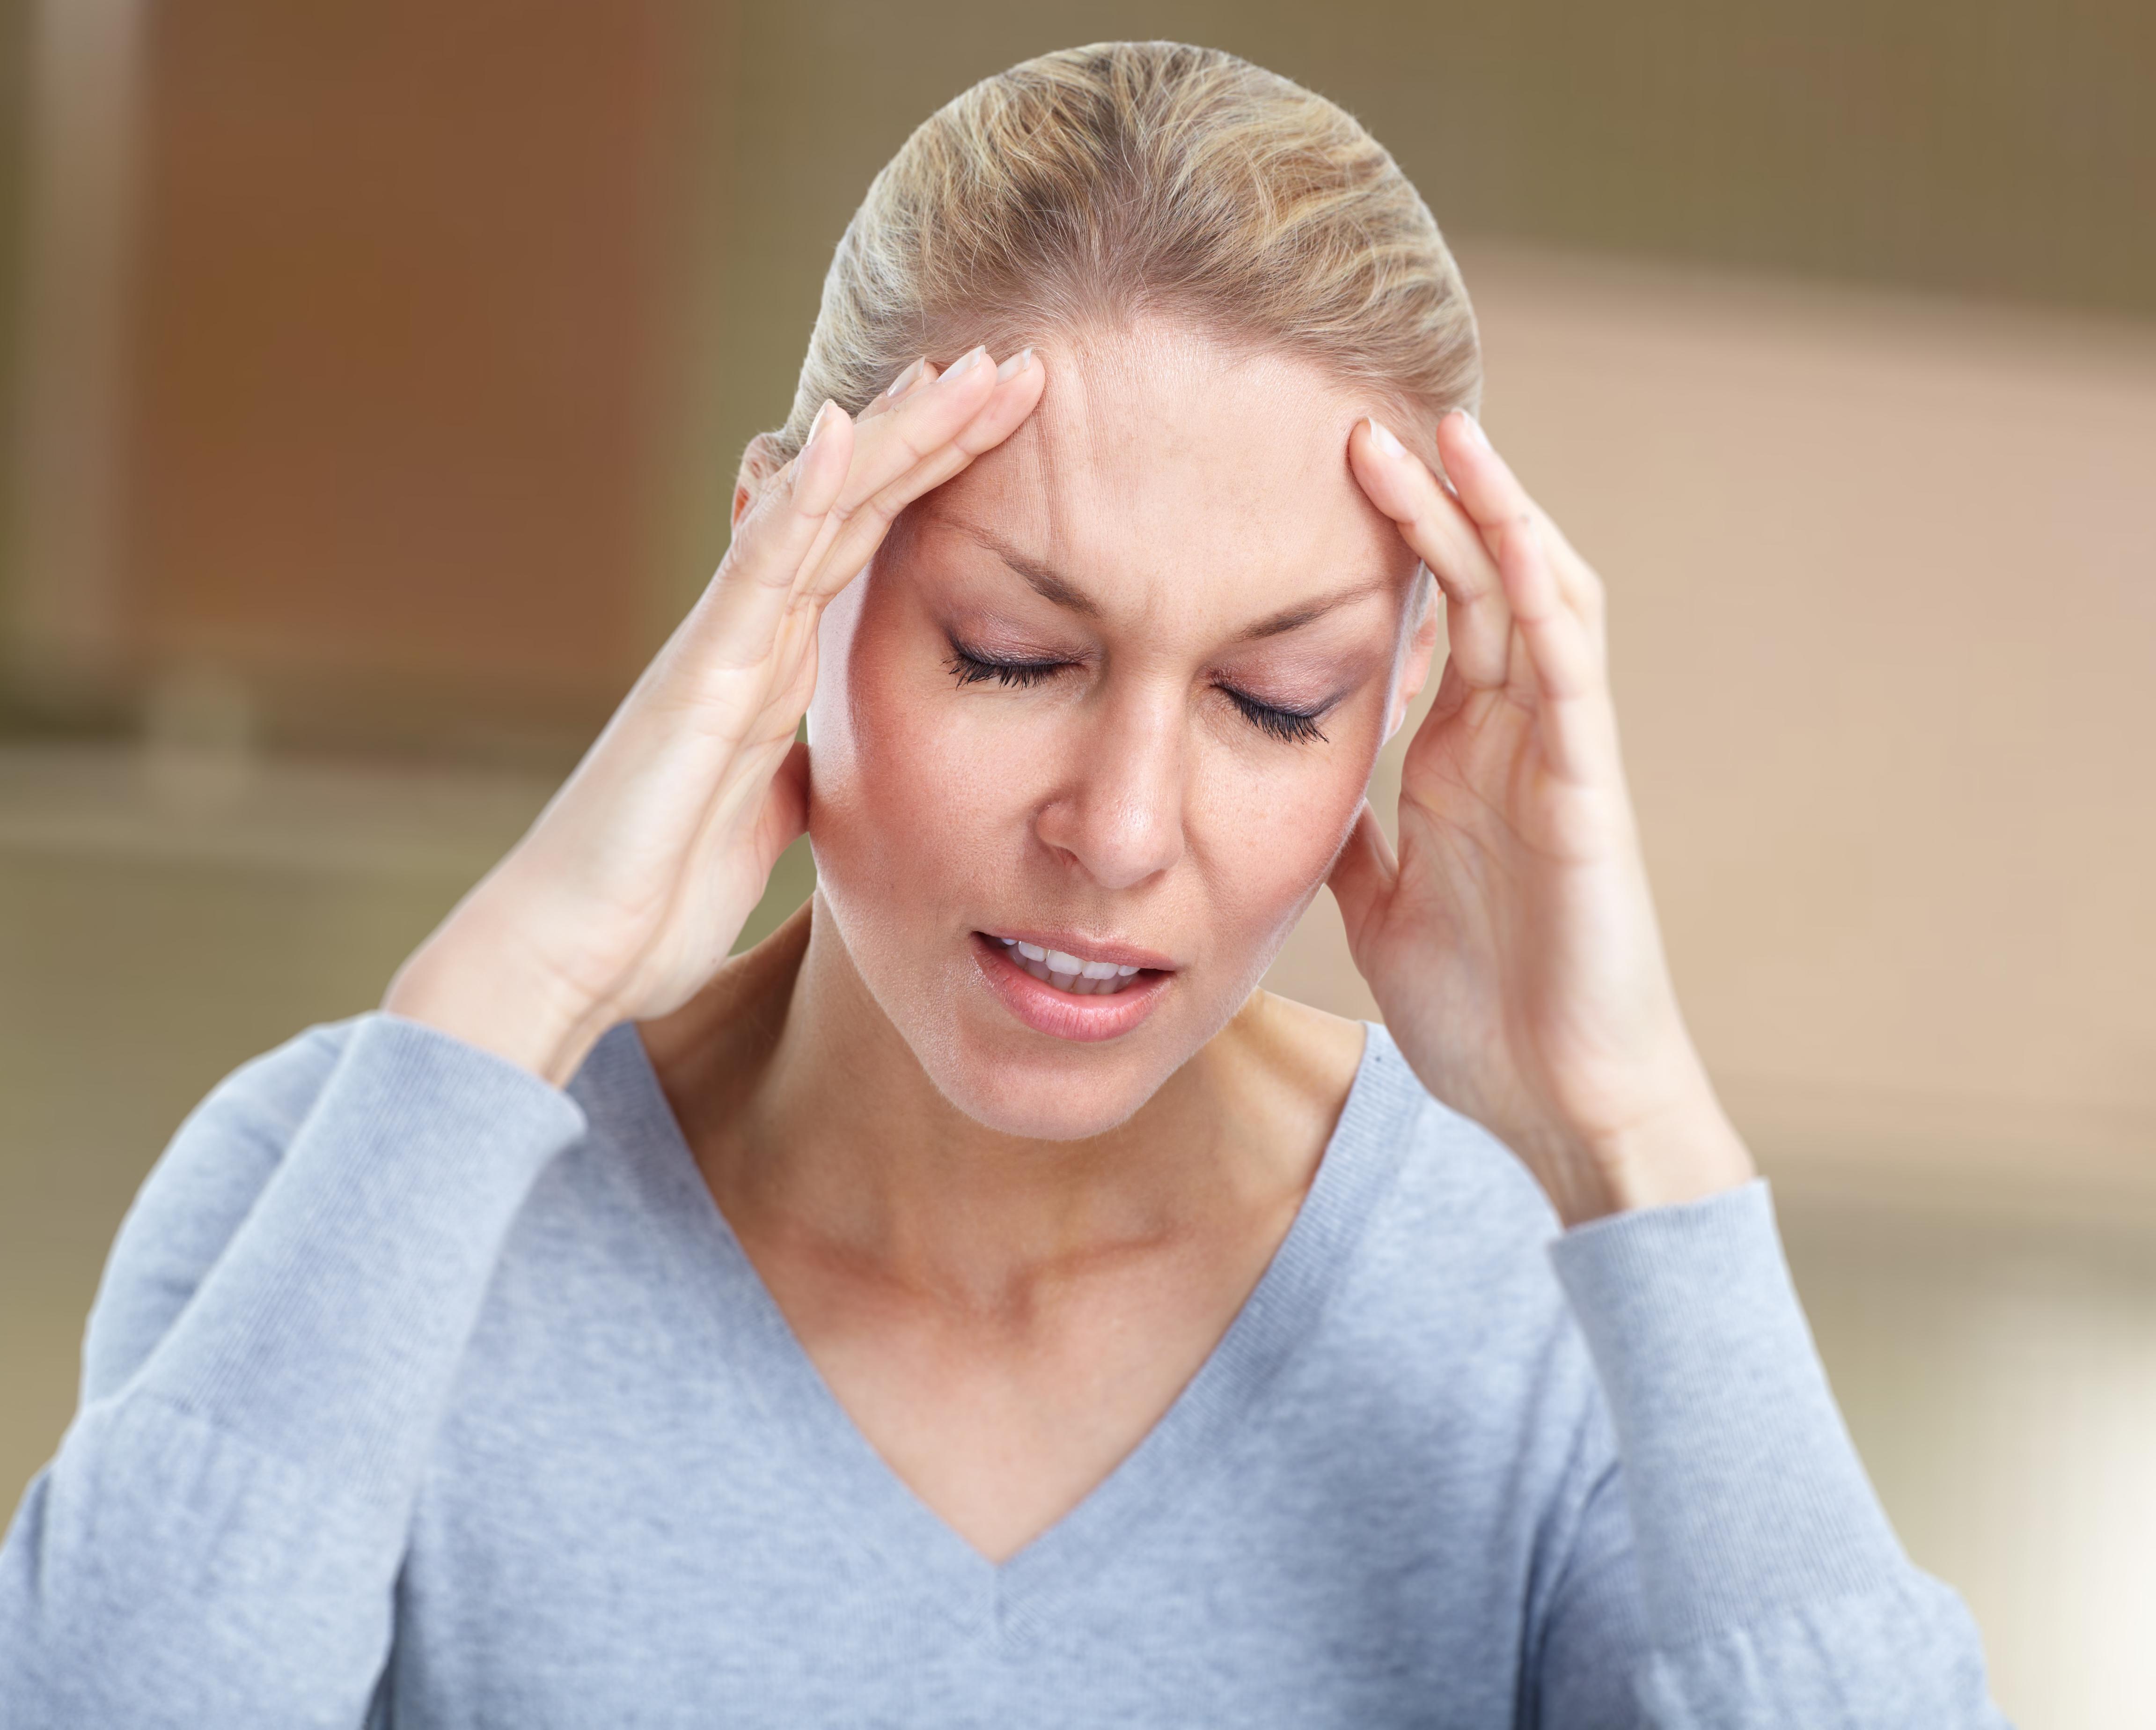 Headache, Headaches, Migraine, Migraines